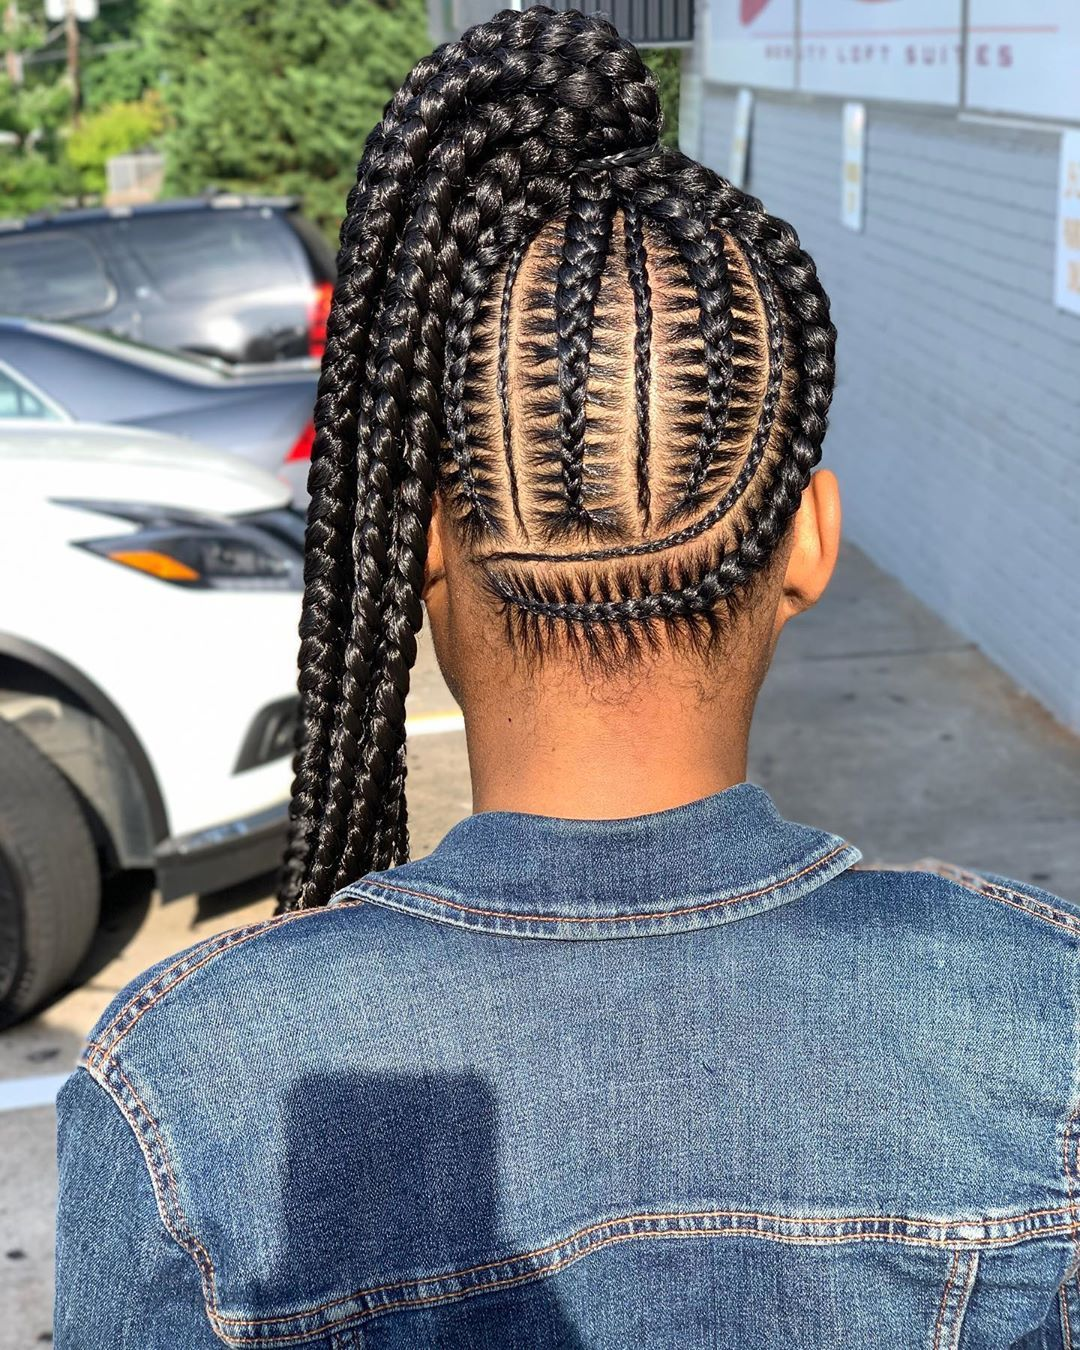 2020 African Hair Braiding Styles Super Flattering Braids You Should Rock Next Hair Styles African Hair Braiding Styles Braids For Black Women